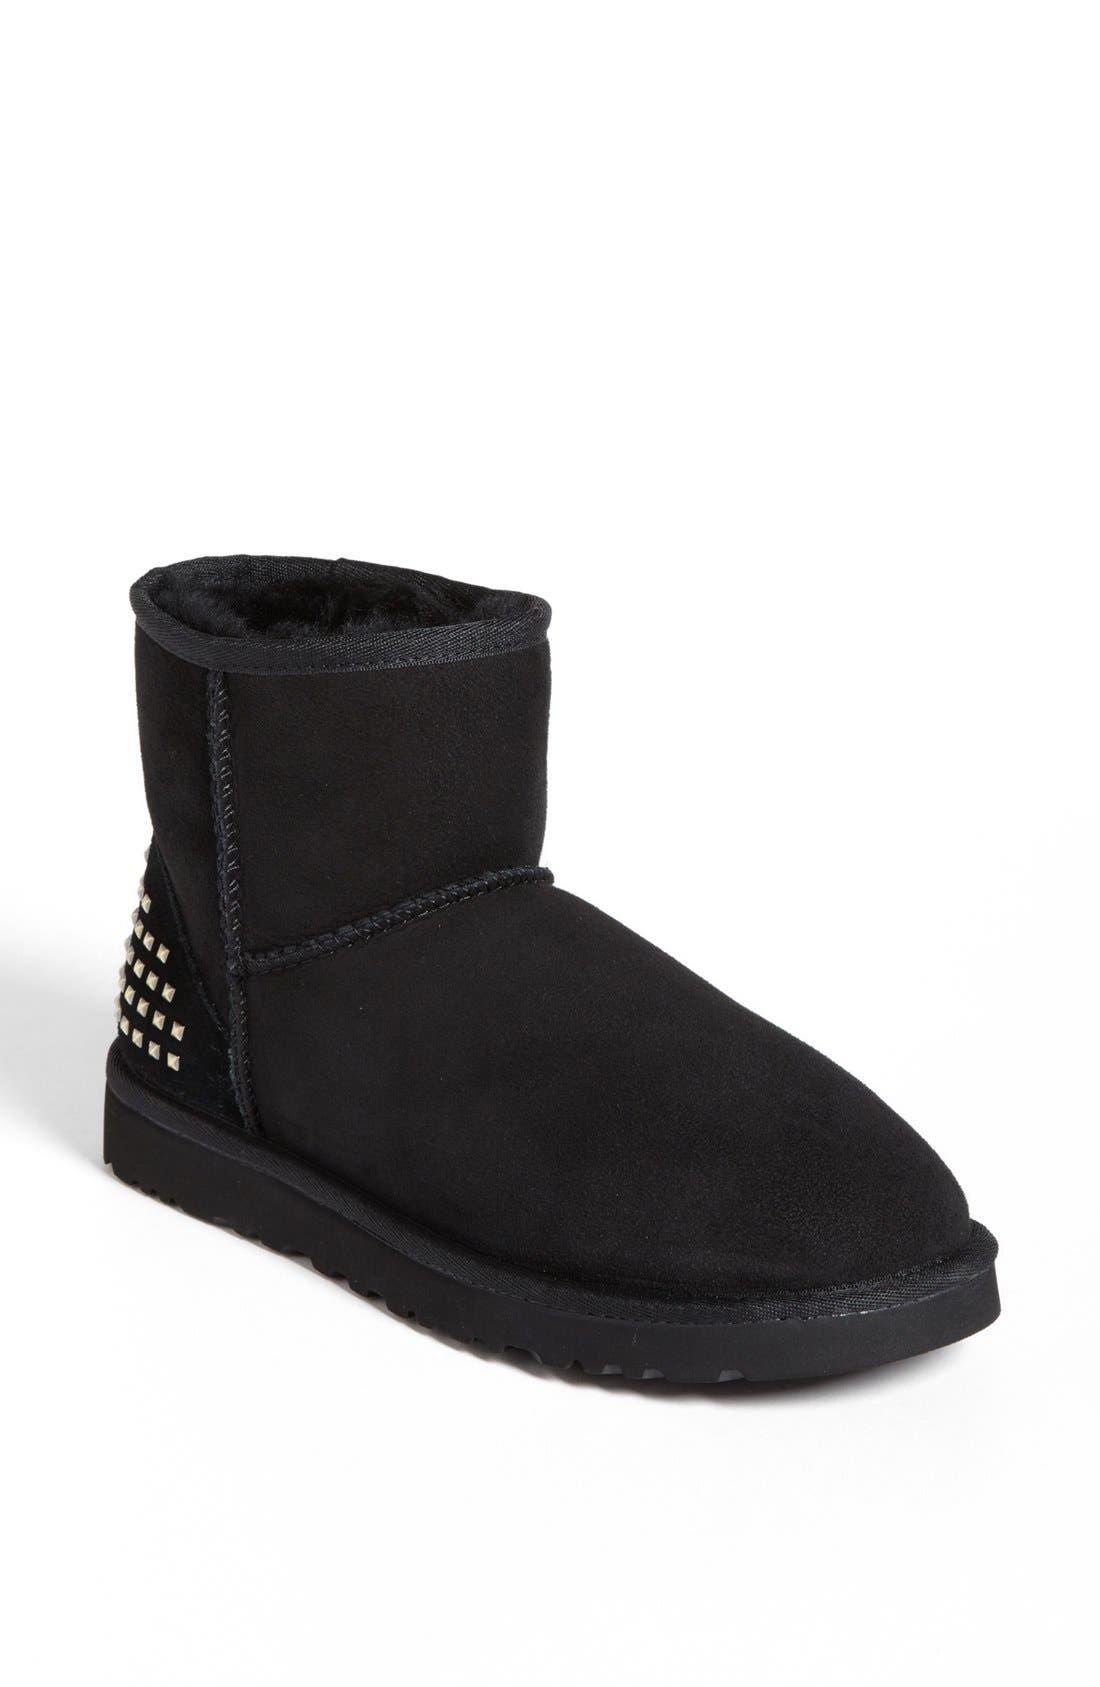 Main Image - UGG® Australia 'Classic Mini Studs' Boot (Women)(Nordstrom Exclusive)